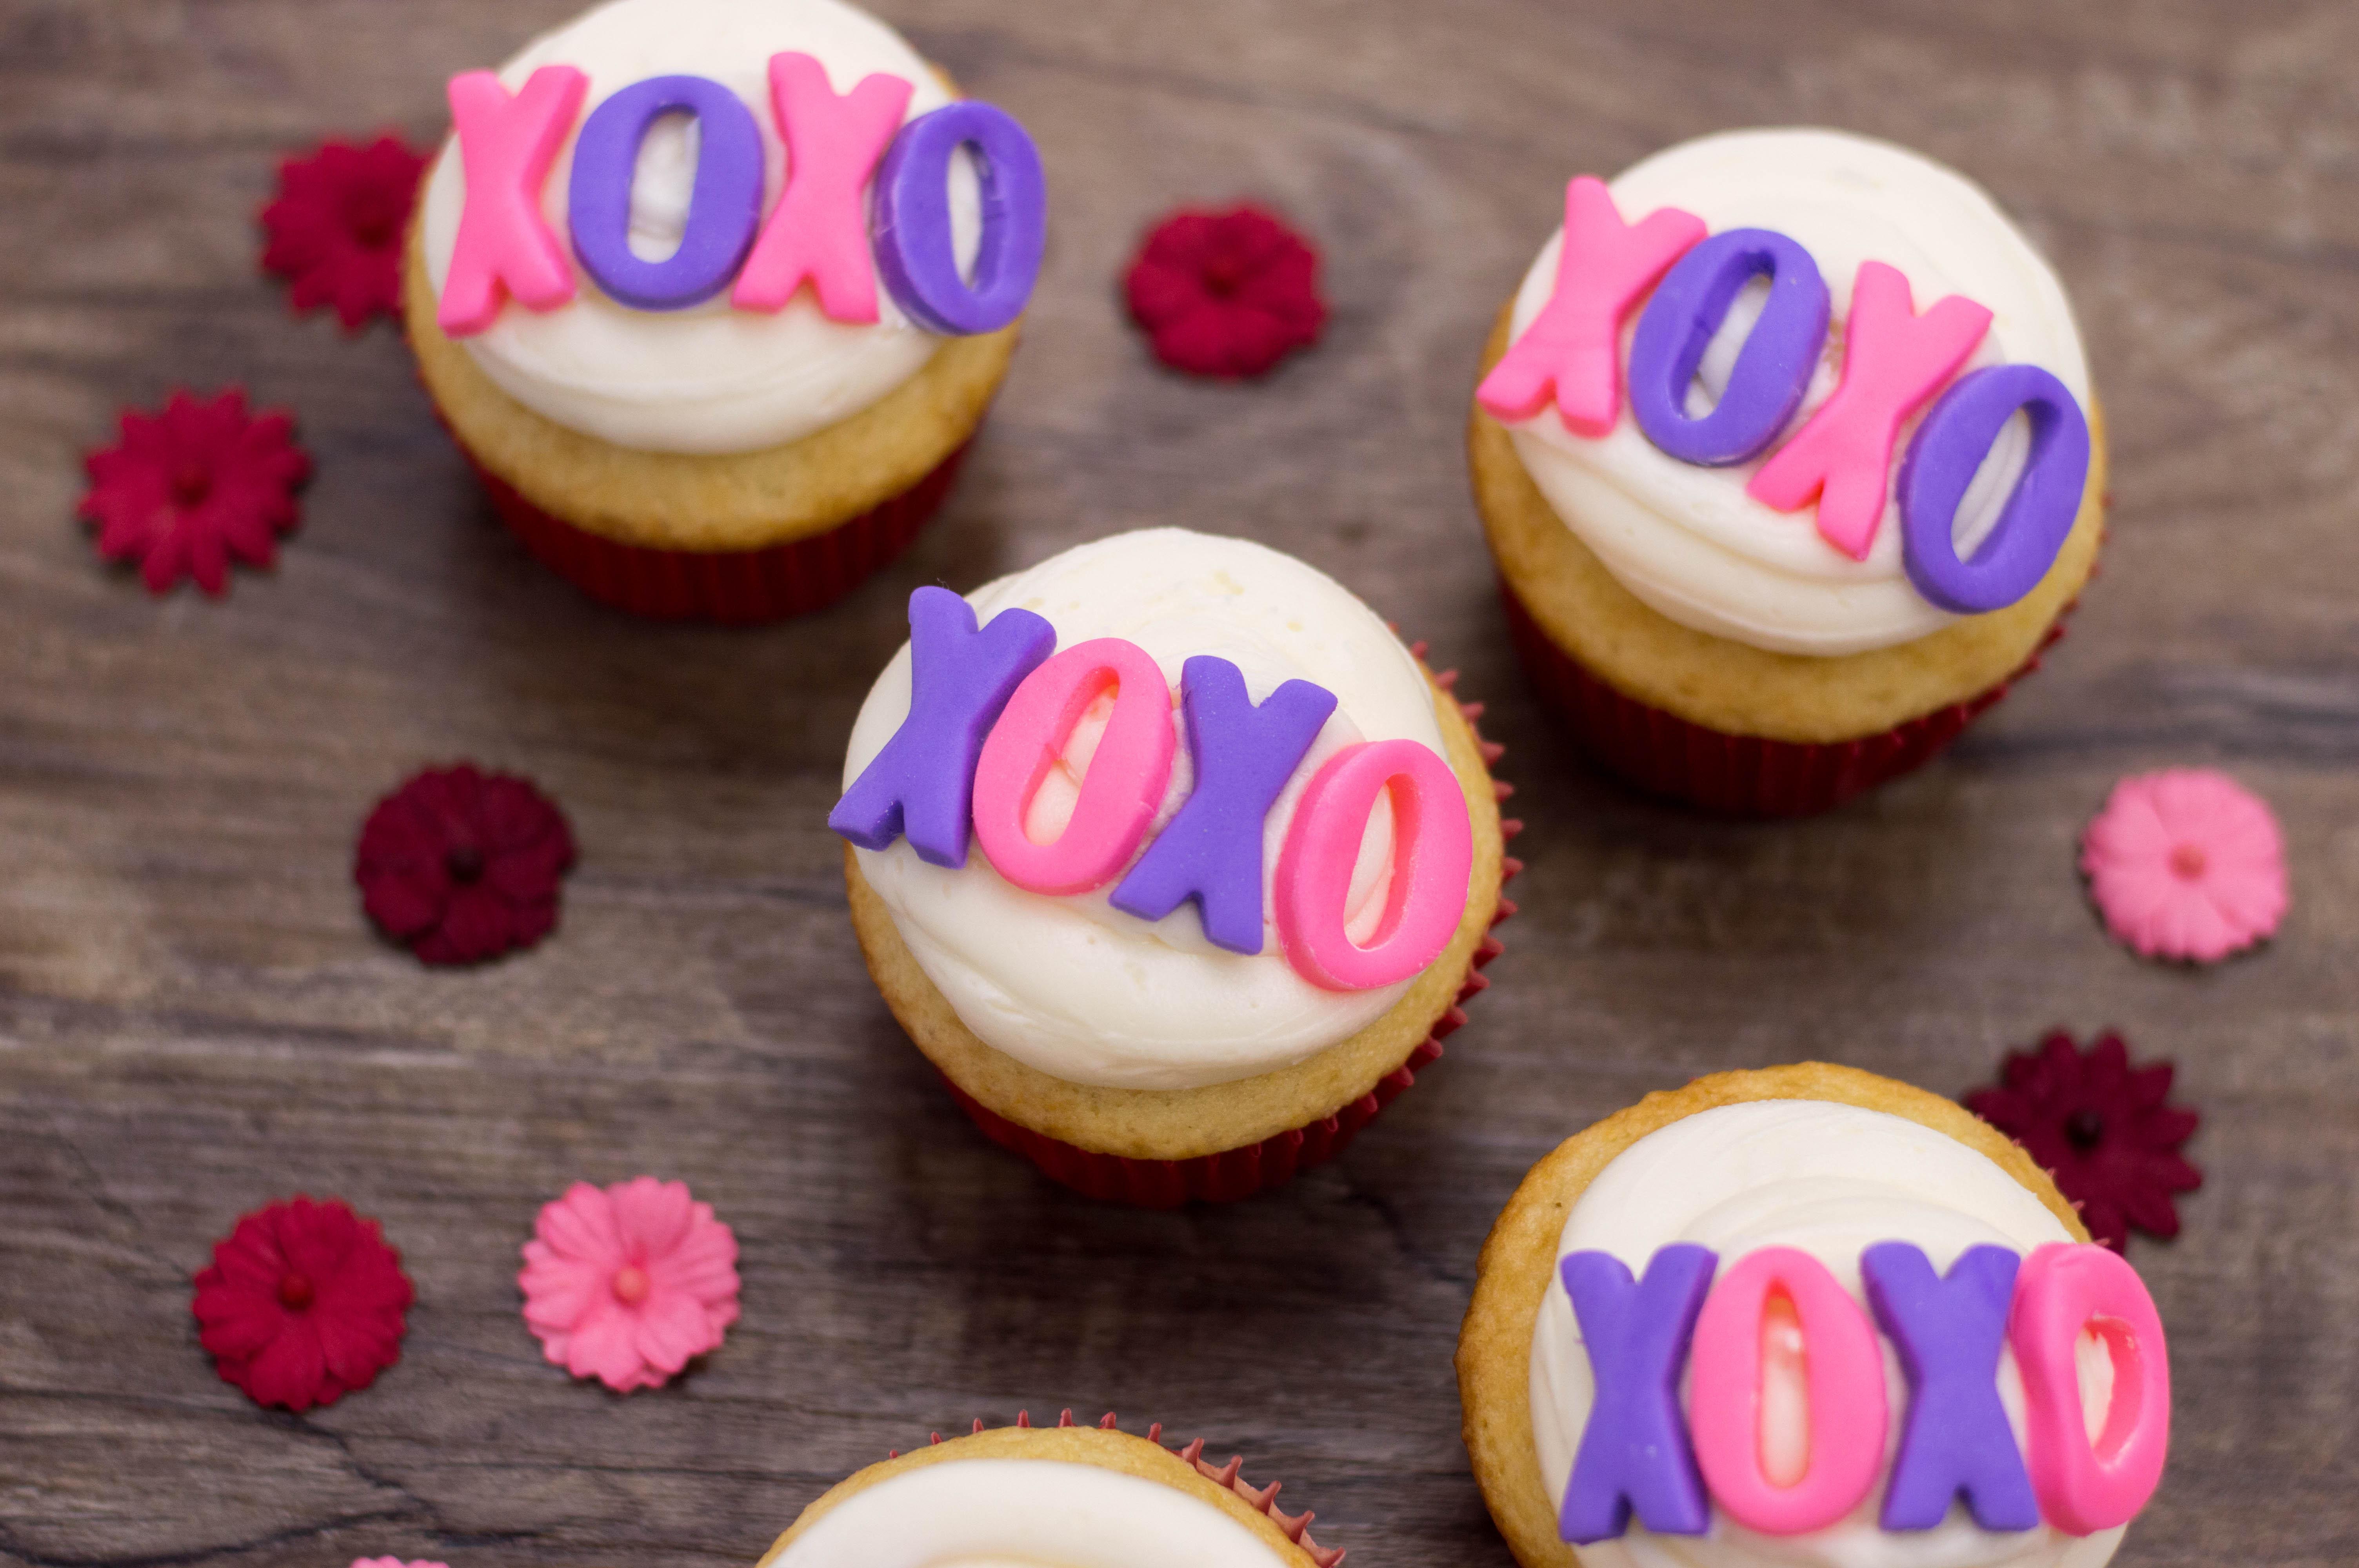 Xoxo Cupcakes For Valentines Day Unskinny Boppy